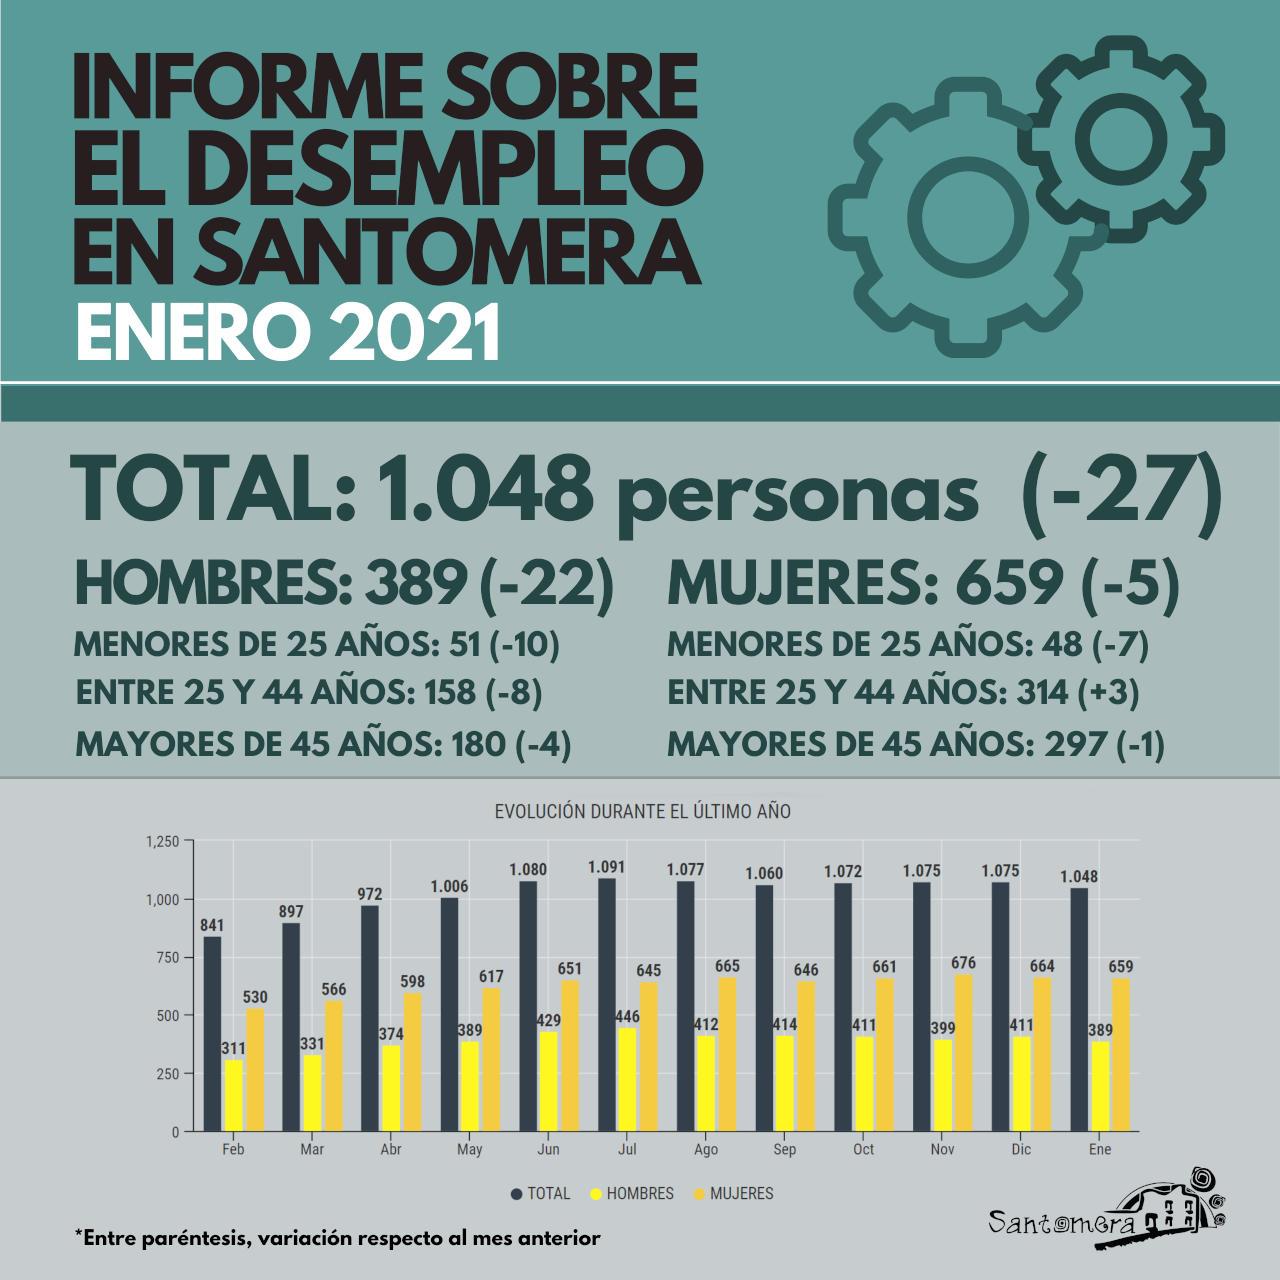 20210202_Datos desempleo enero 2021